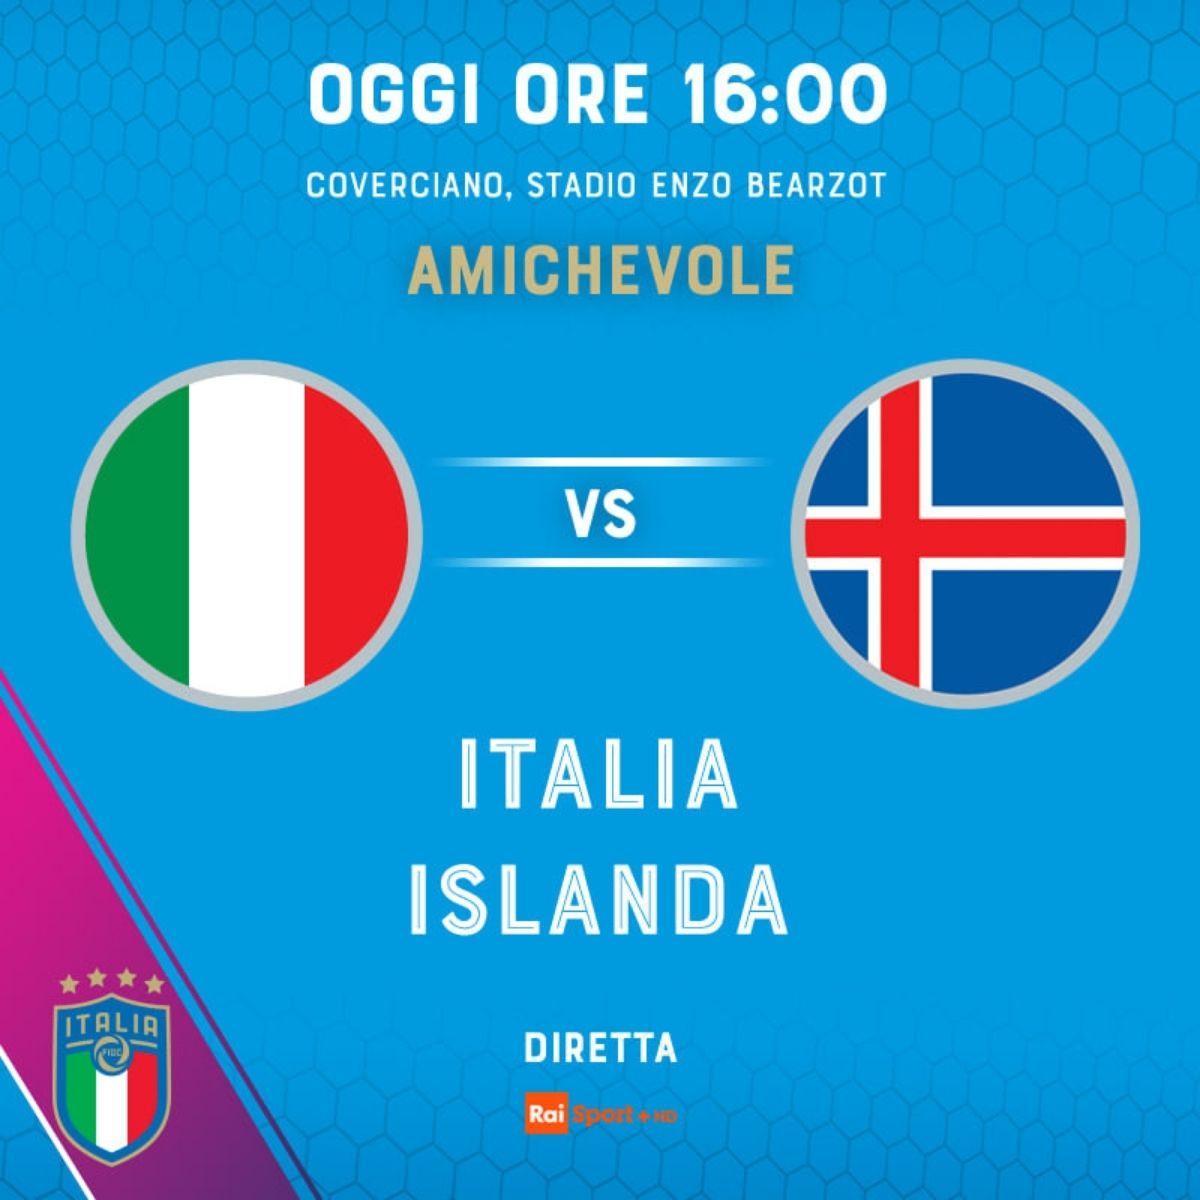 Italia Islanda femminile